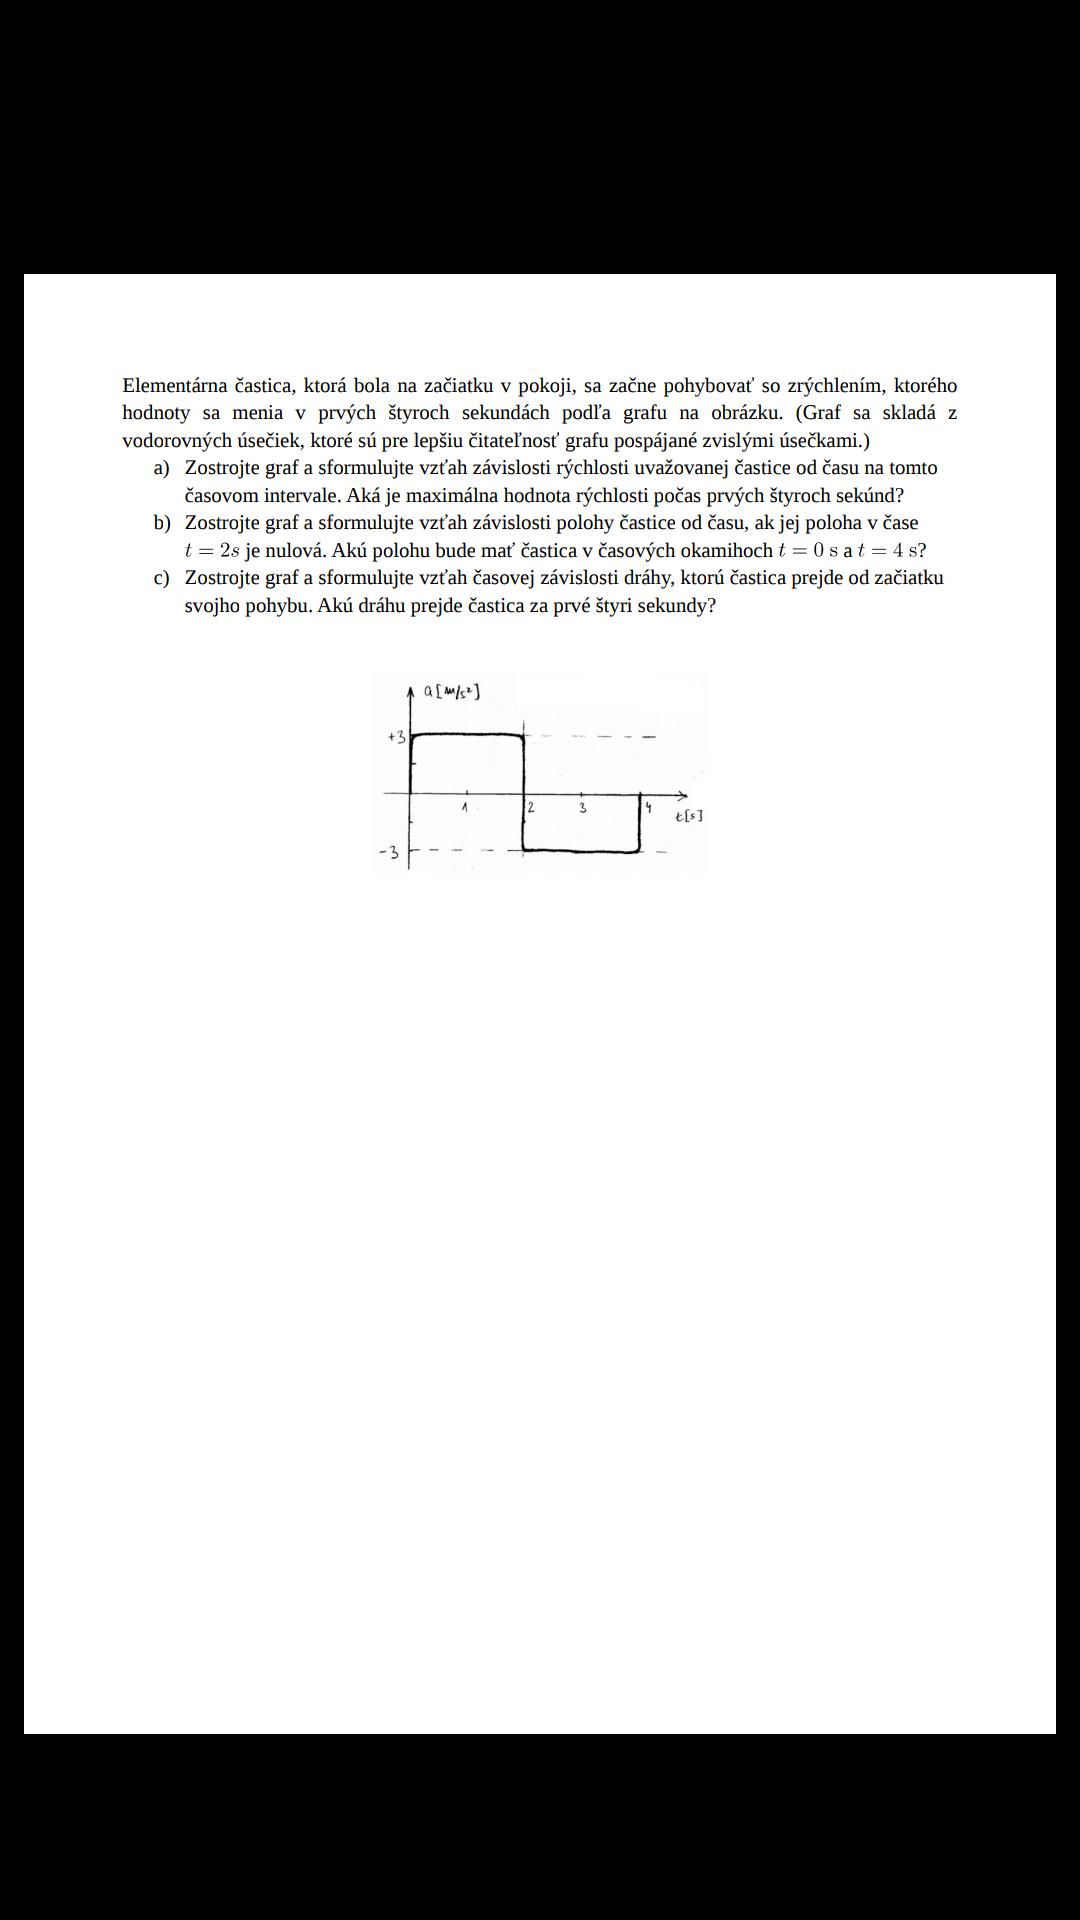 http://forum.matematika.cz/upload3/img/2018-06/44887_1.png